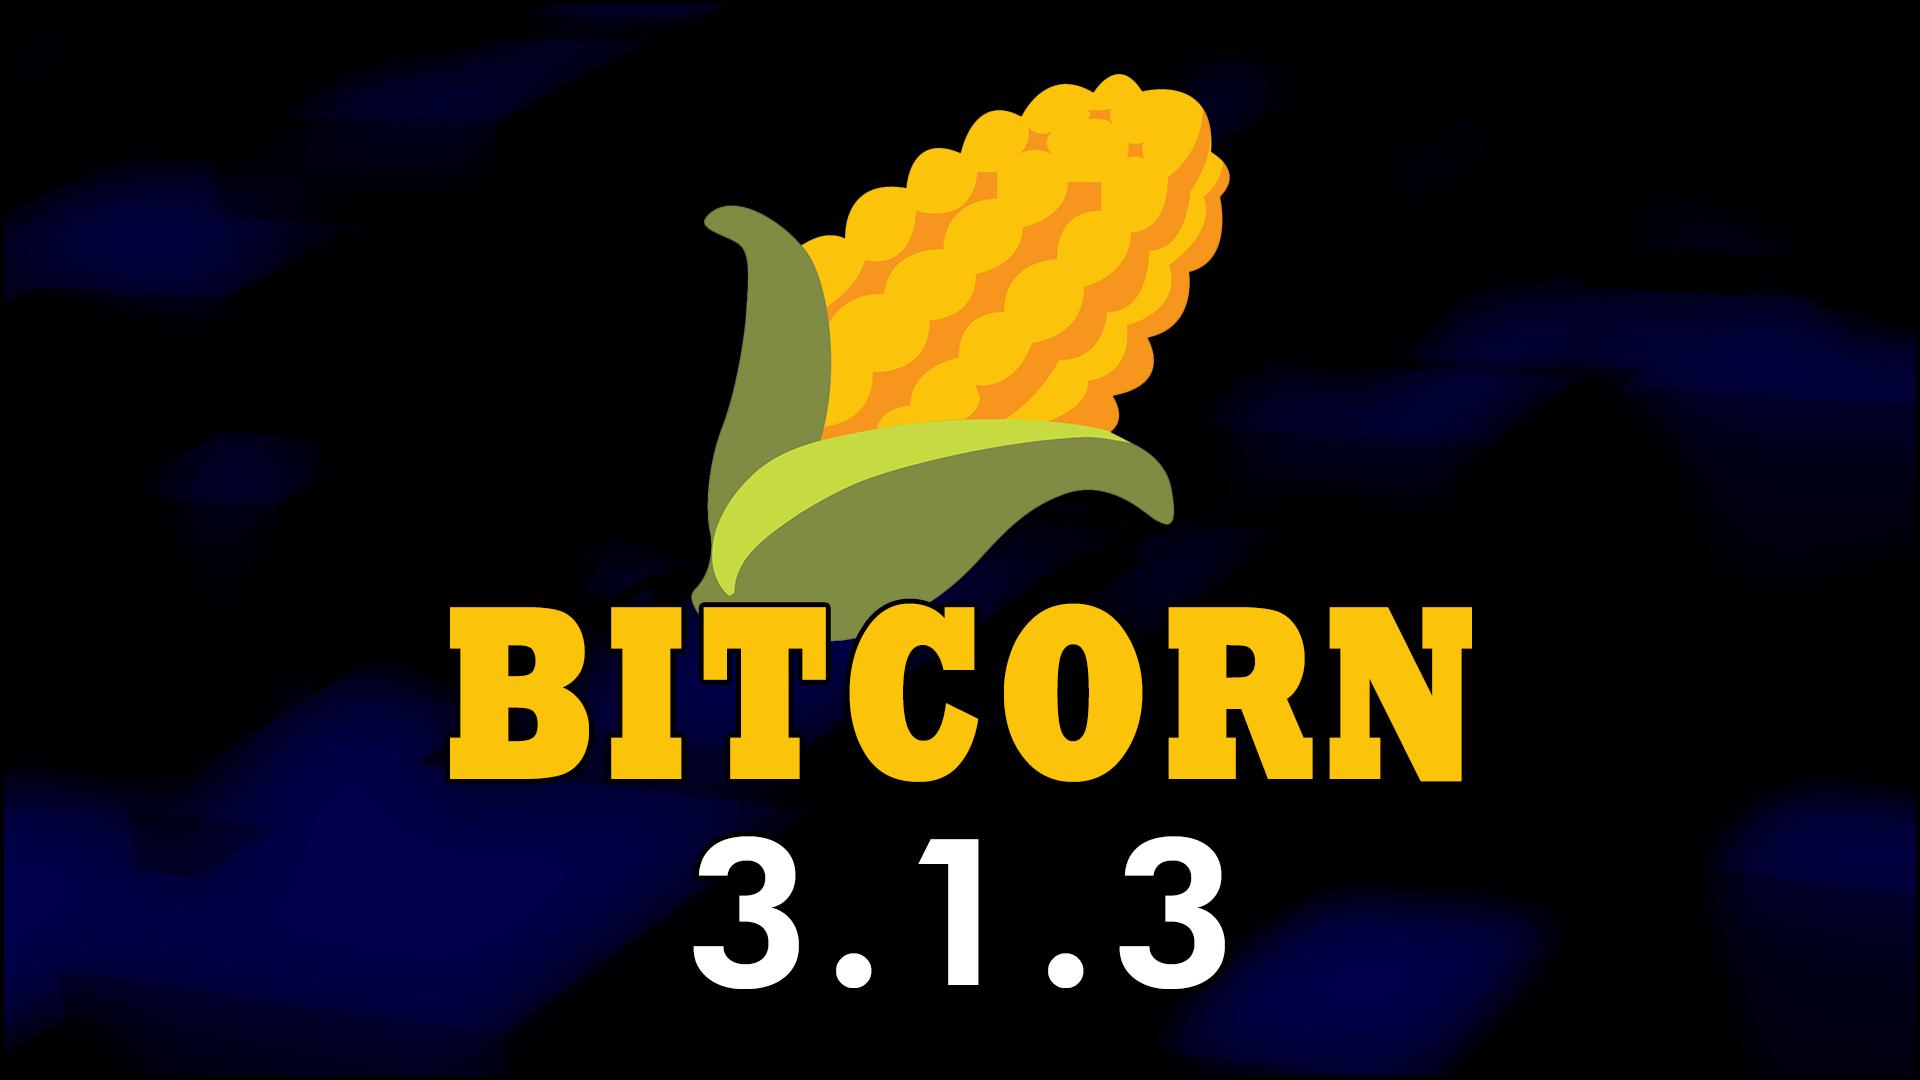 BITCORN Masternode v3.1.3